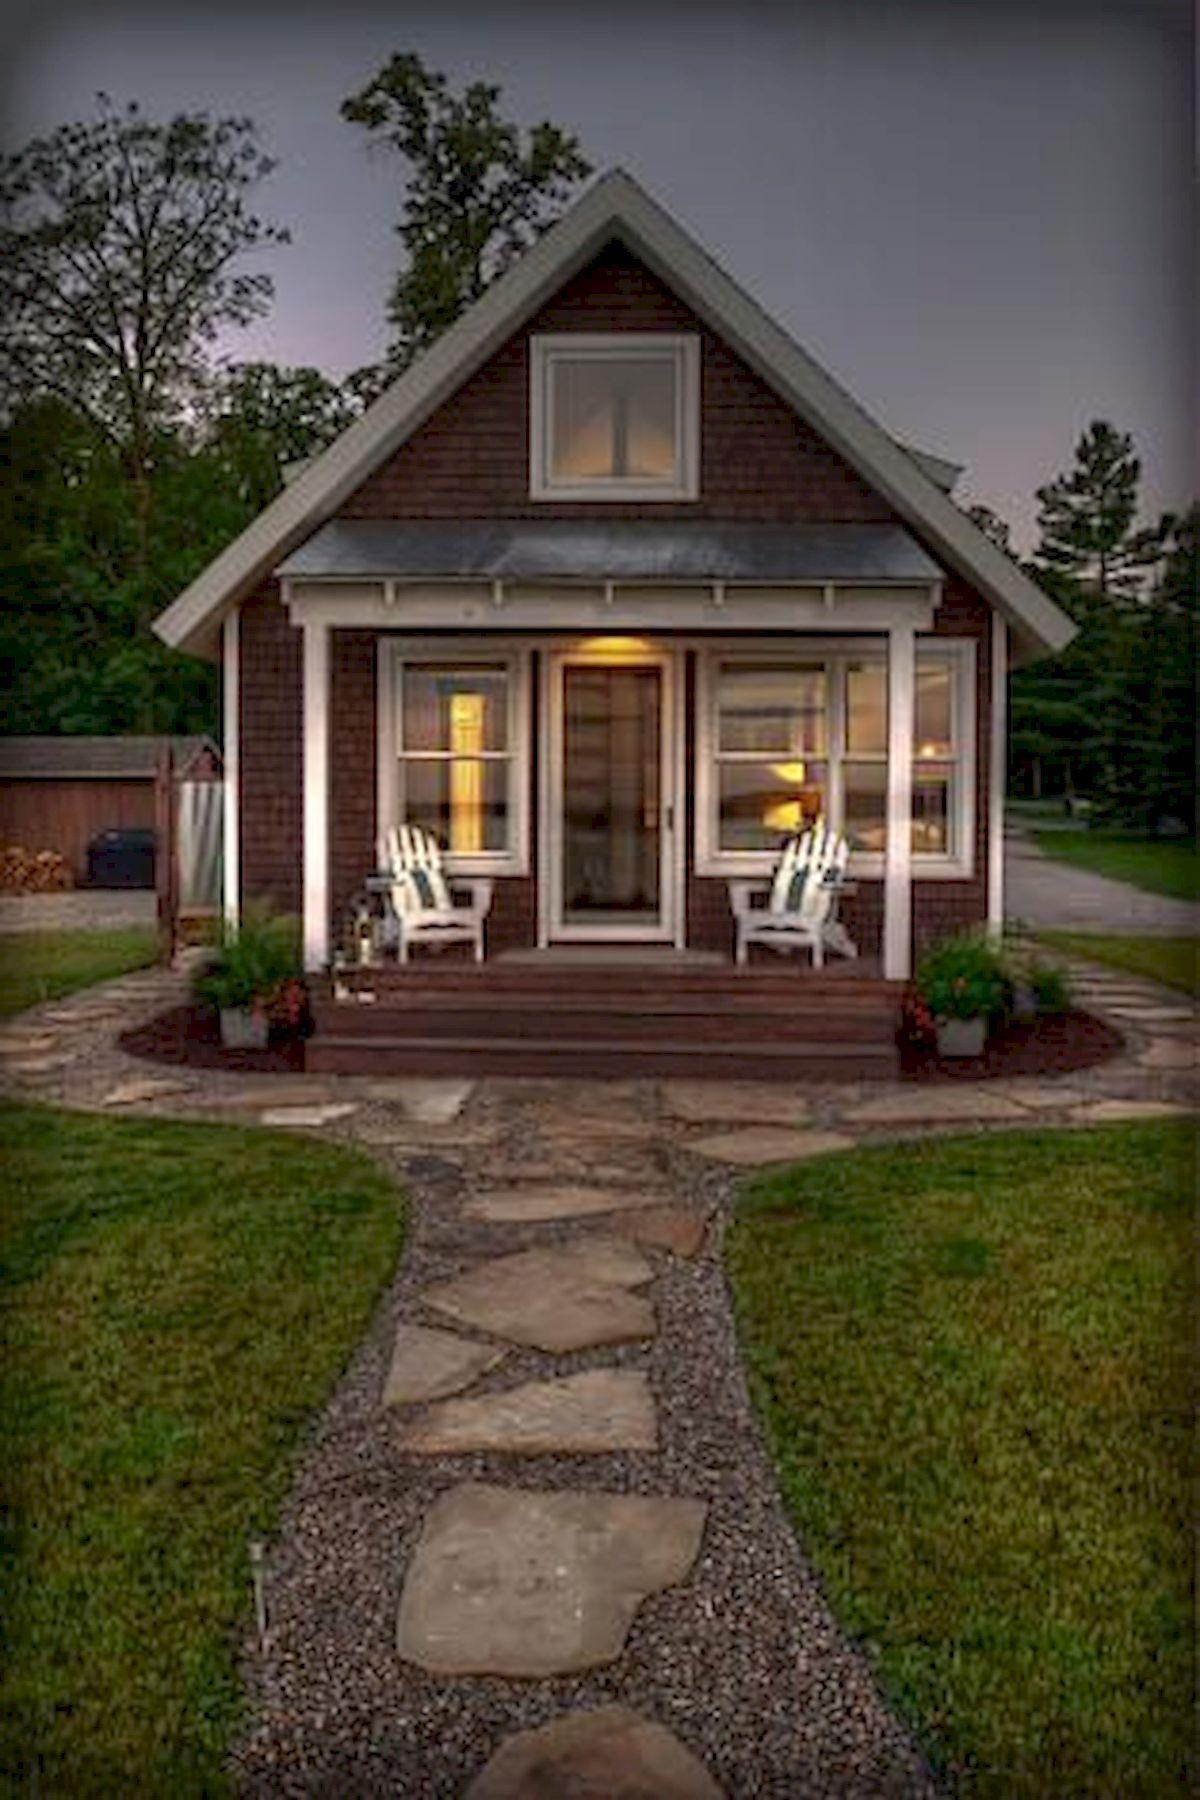 20 Nice Cottage Bathroom Tile Ideas And Pictures: 60 Adorable Farmhouse Cottage Design Ideas And Decor